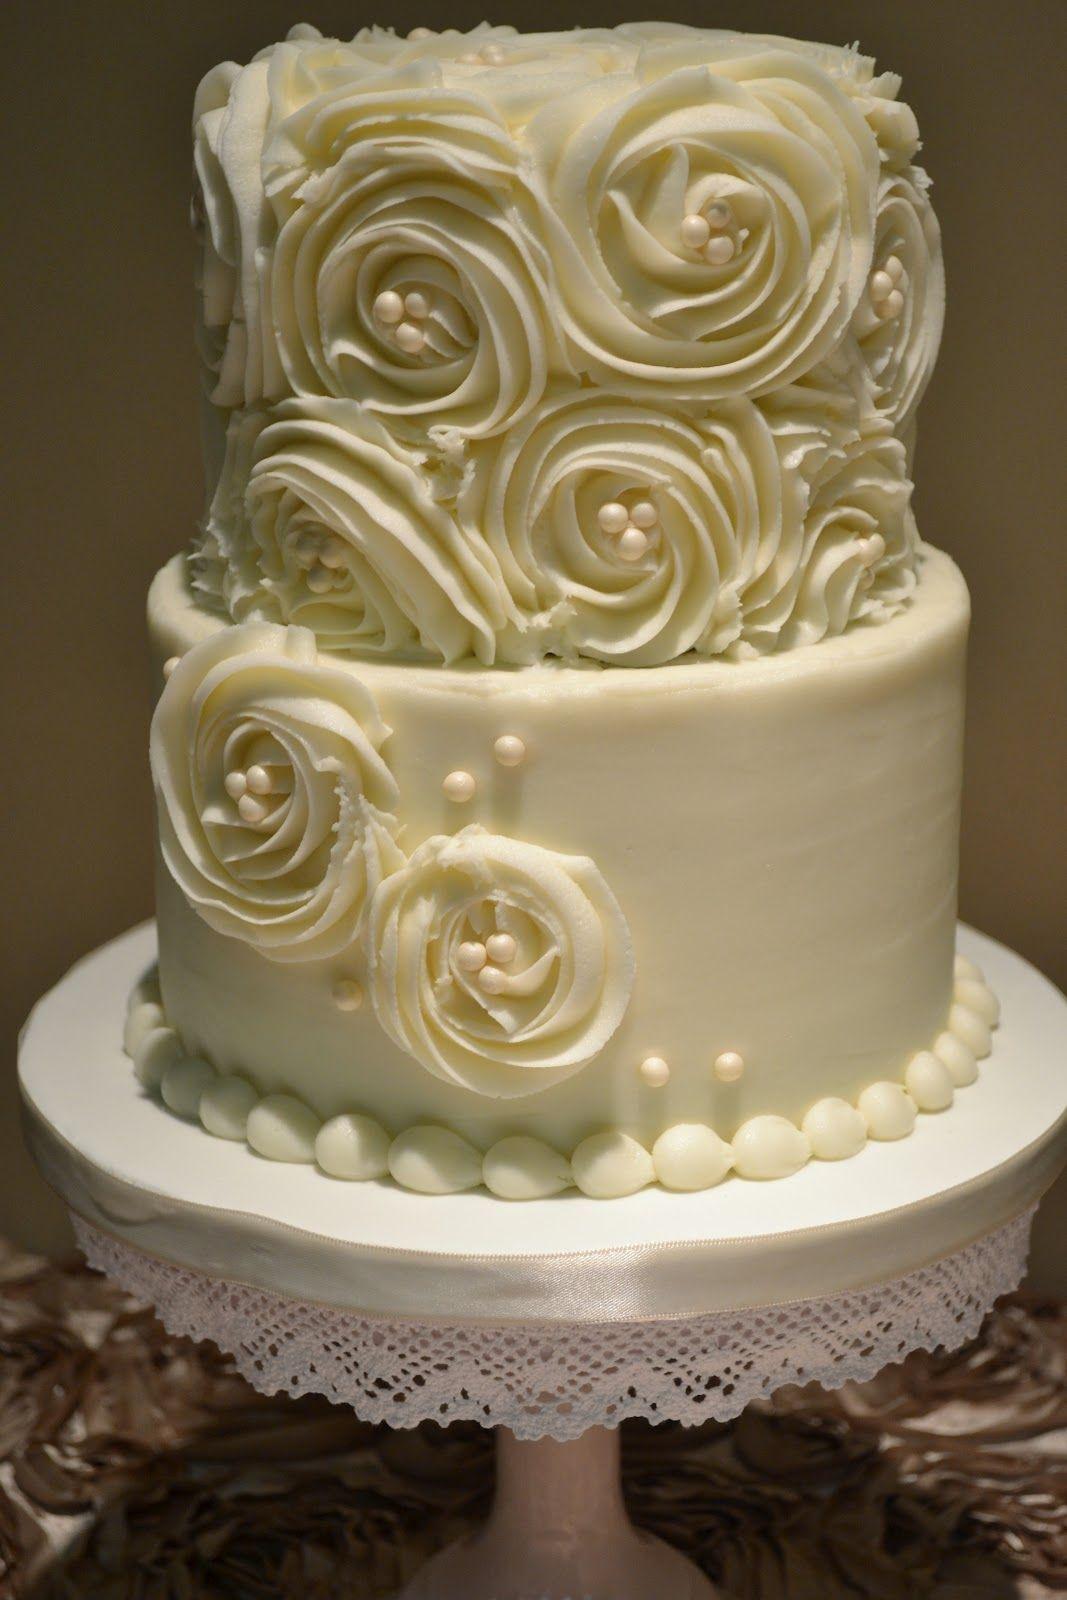 Love it! Simple yet elegant Fondant wedding cakes